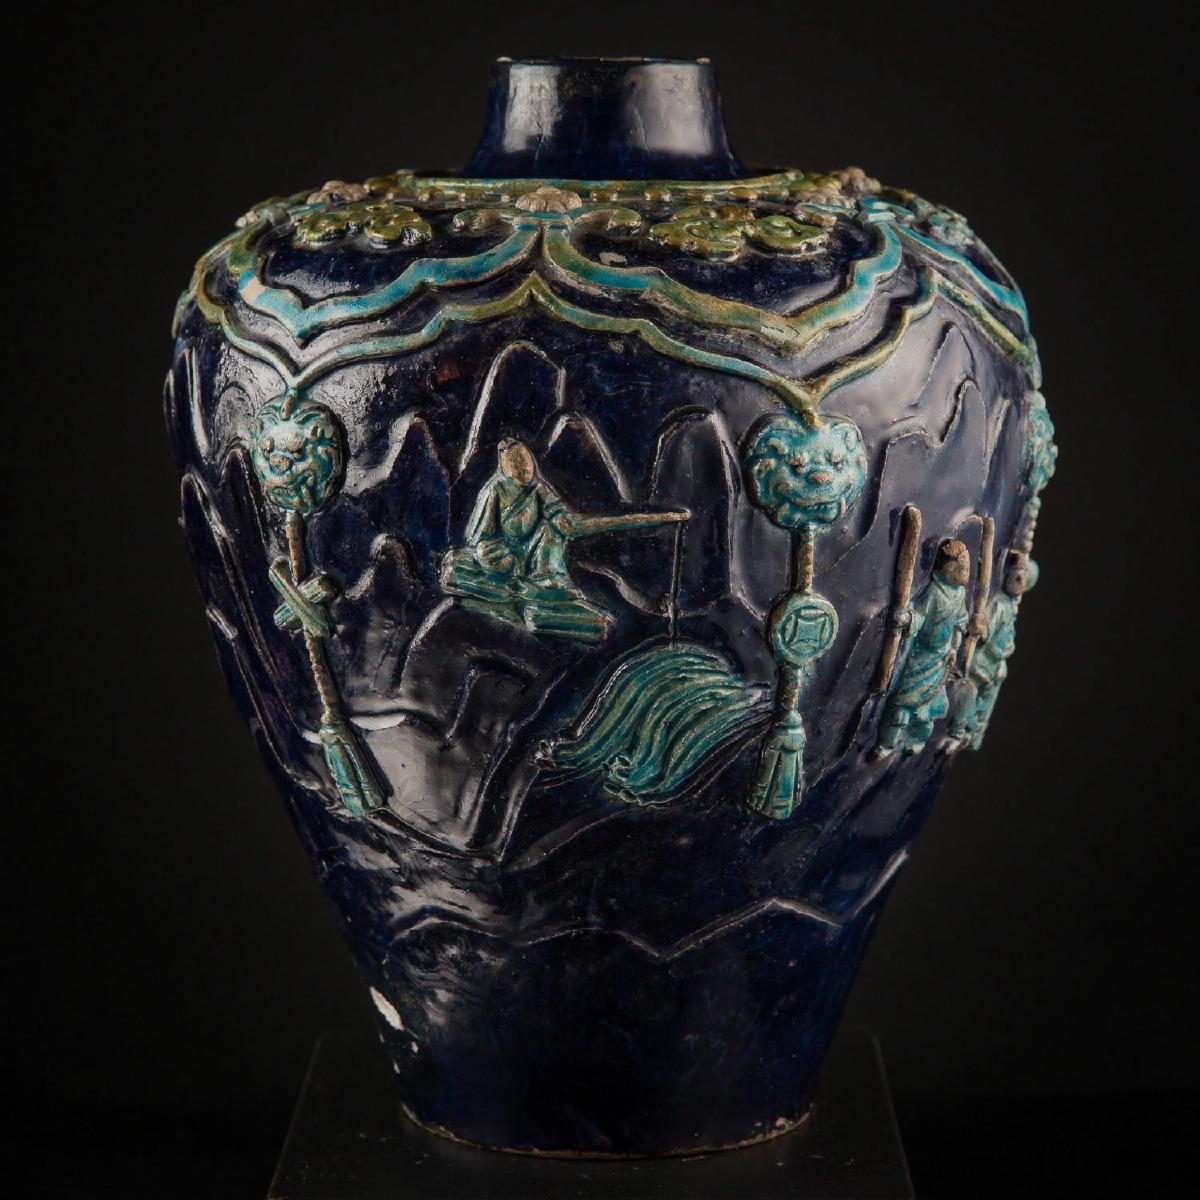 Photo of fatua-vase-from-the-rockefeller-collection-metropolitan-musuem-of-new-york